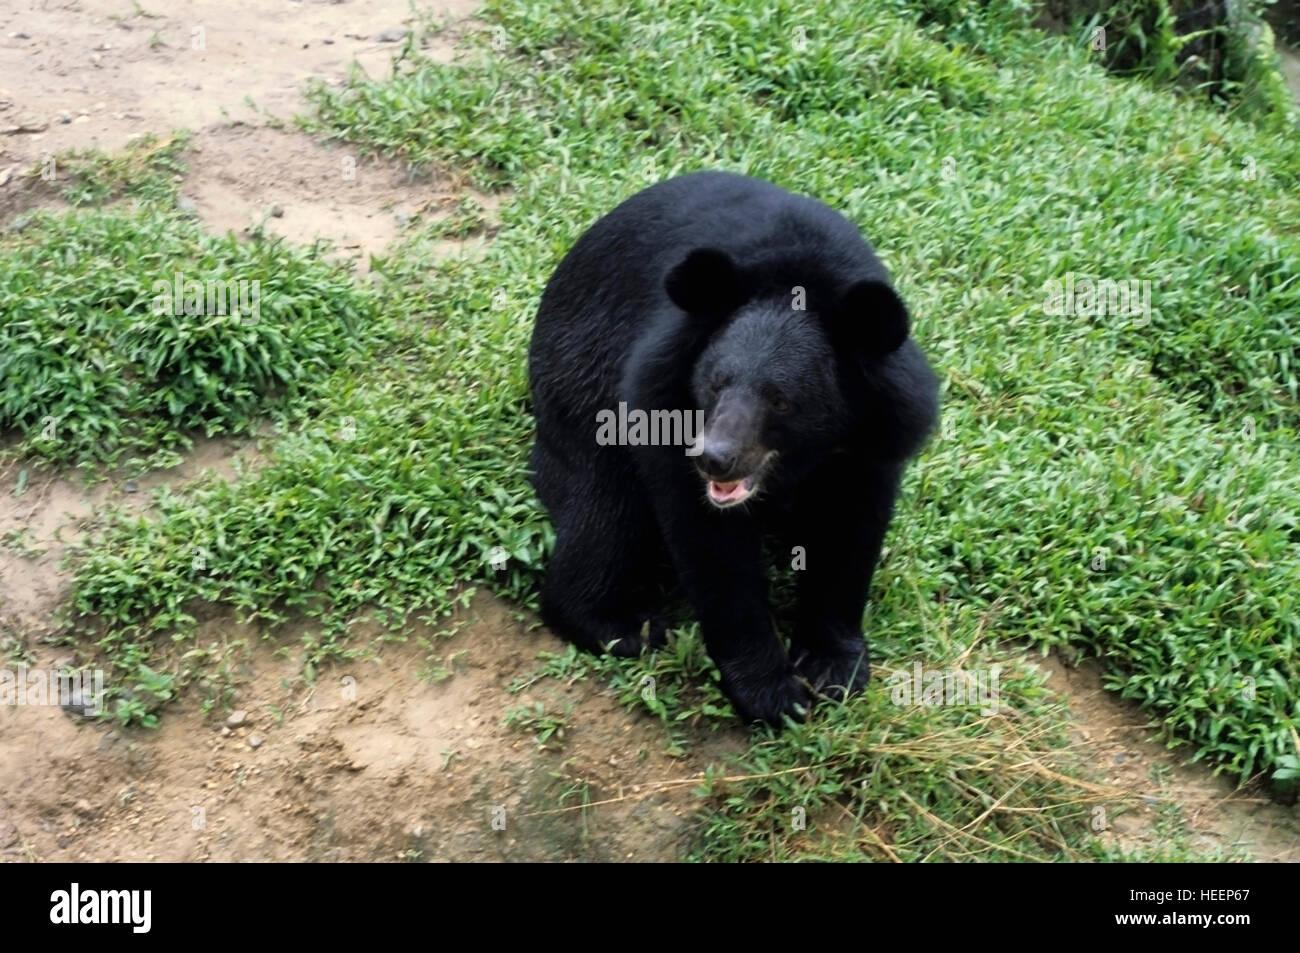 Himalayan Black Bear, Selenarctos thibetanus on Mountain Slopes, Photograph taken in Controlled Environment - Stock Image